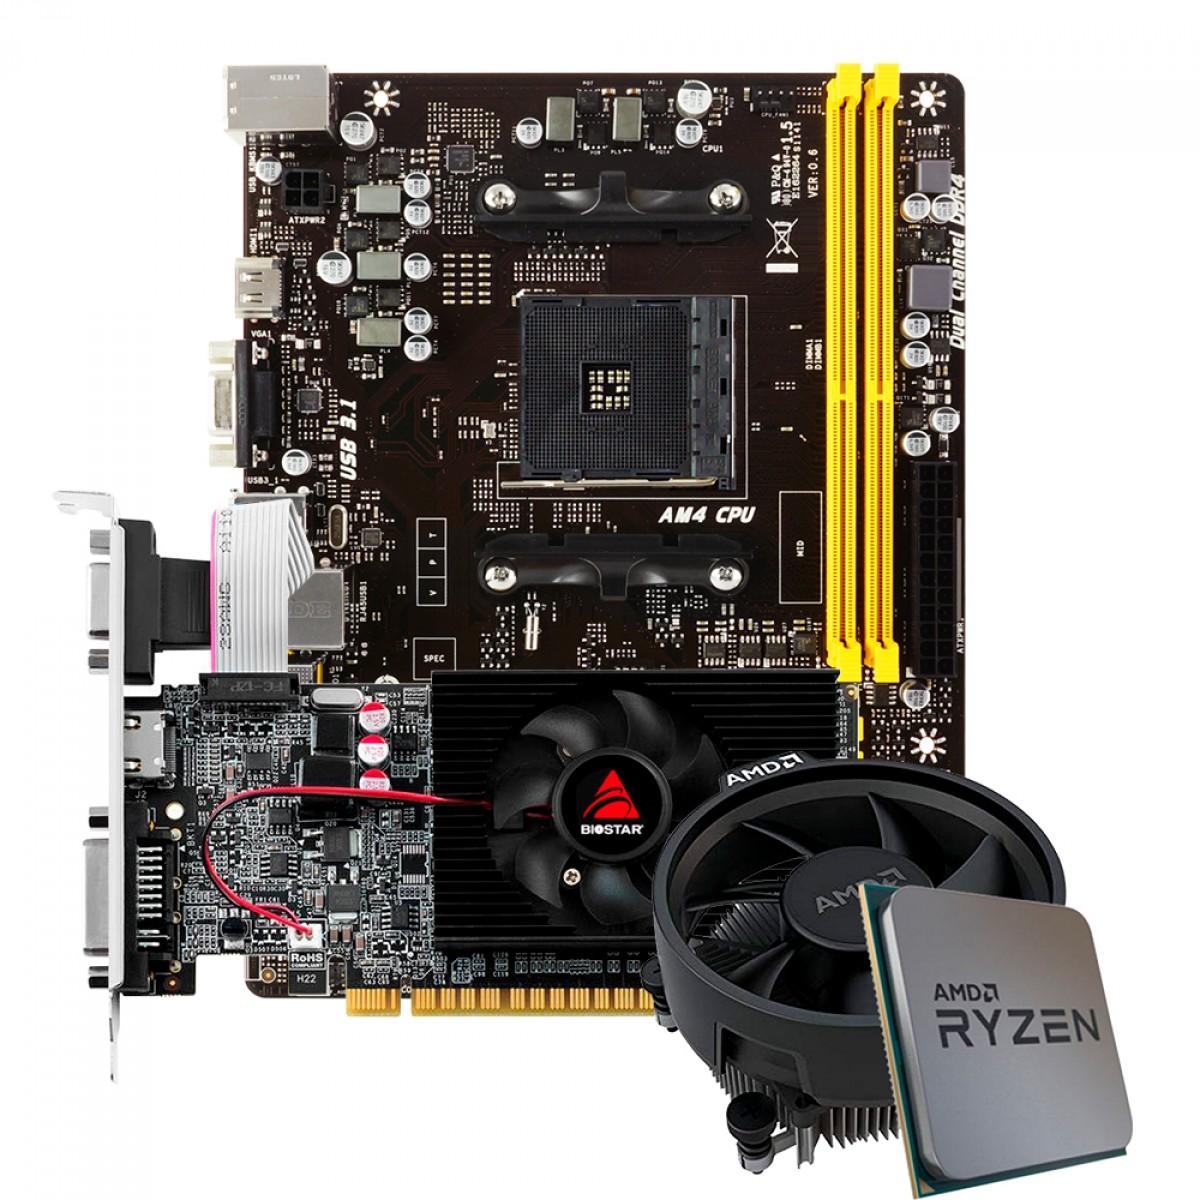 Kit Upgrade Biostar GeForce GT 610 + AMD Ryzen 5 3500 + Biostar A320MH